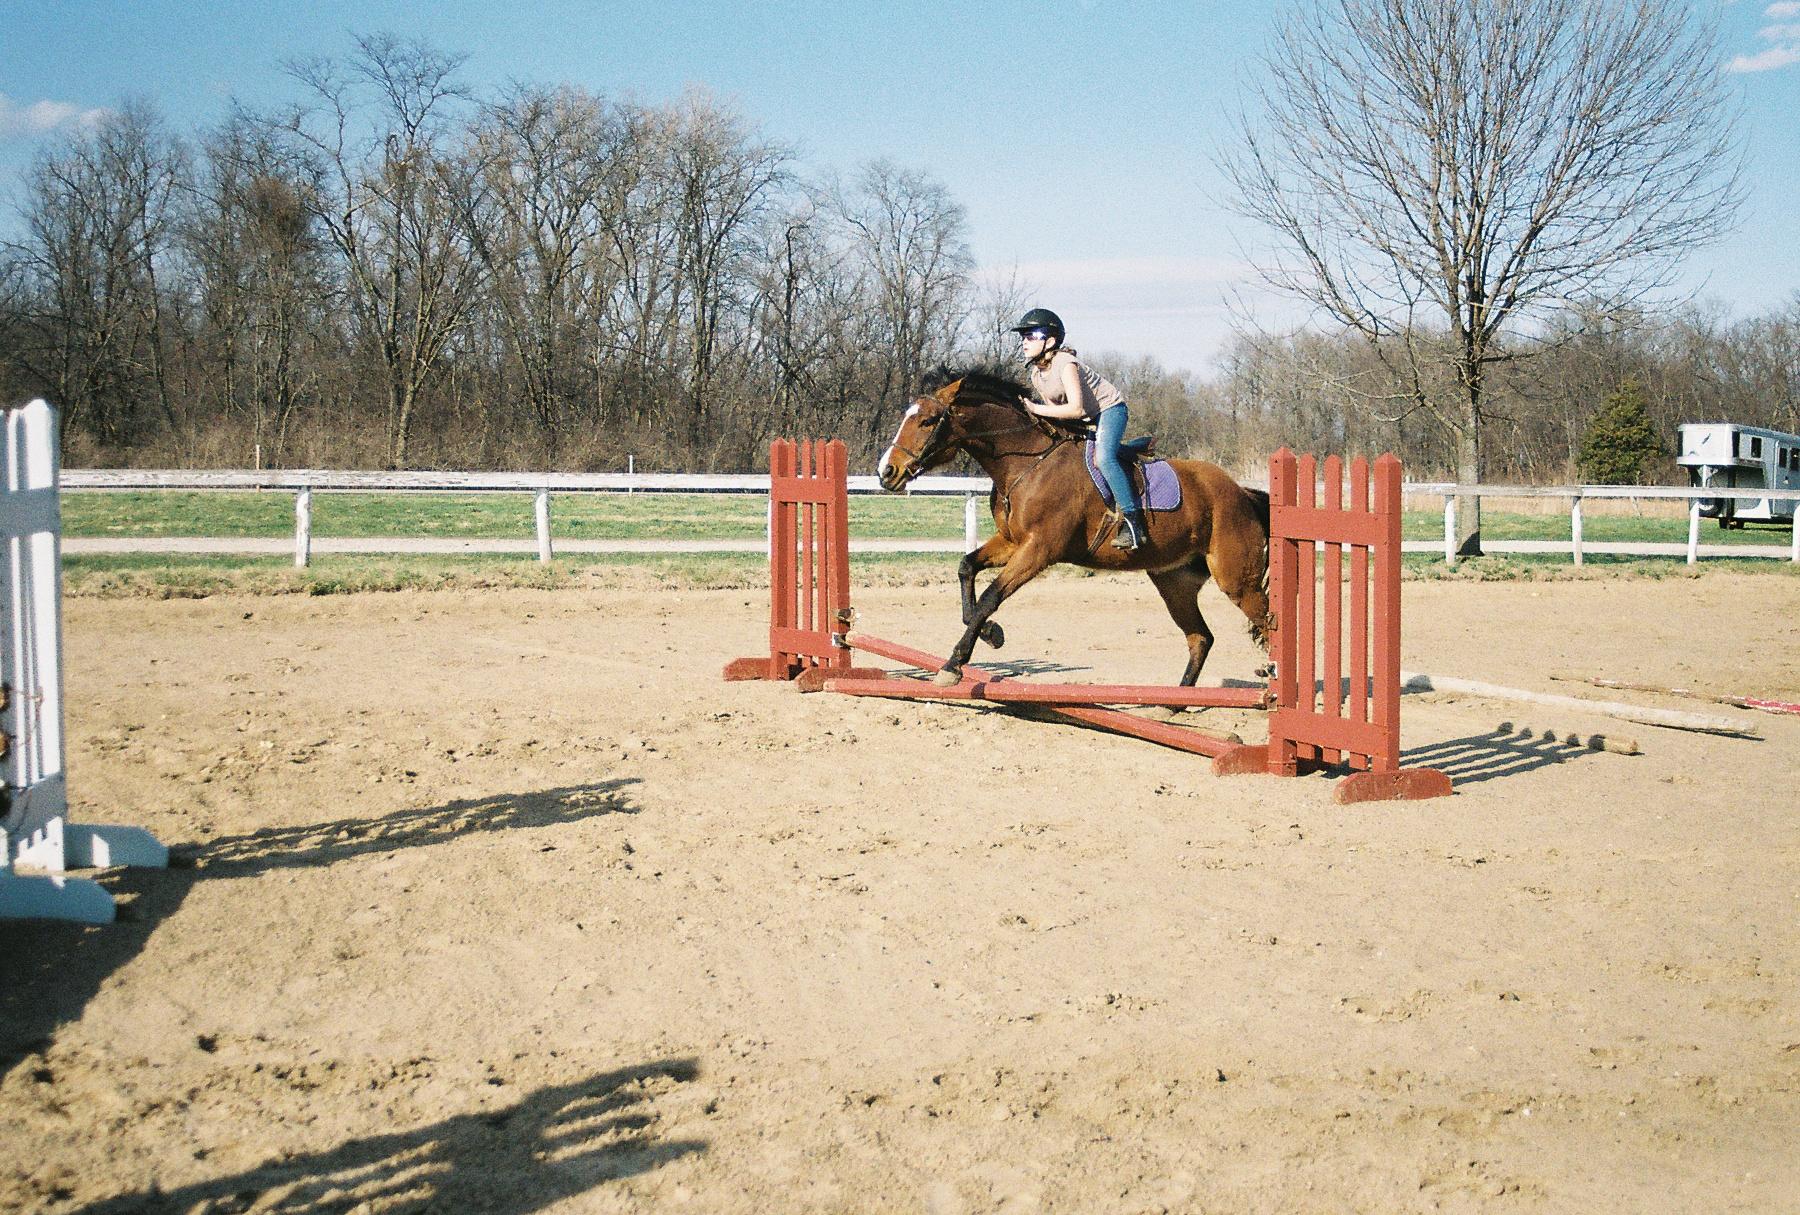 Gretchen Grace riding Ivy, spring 2011